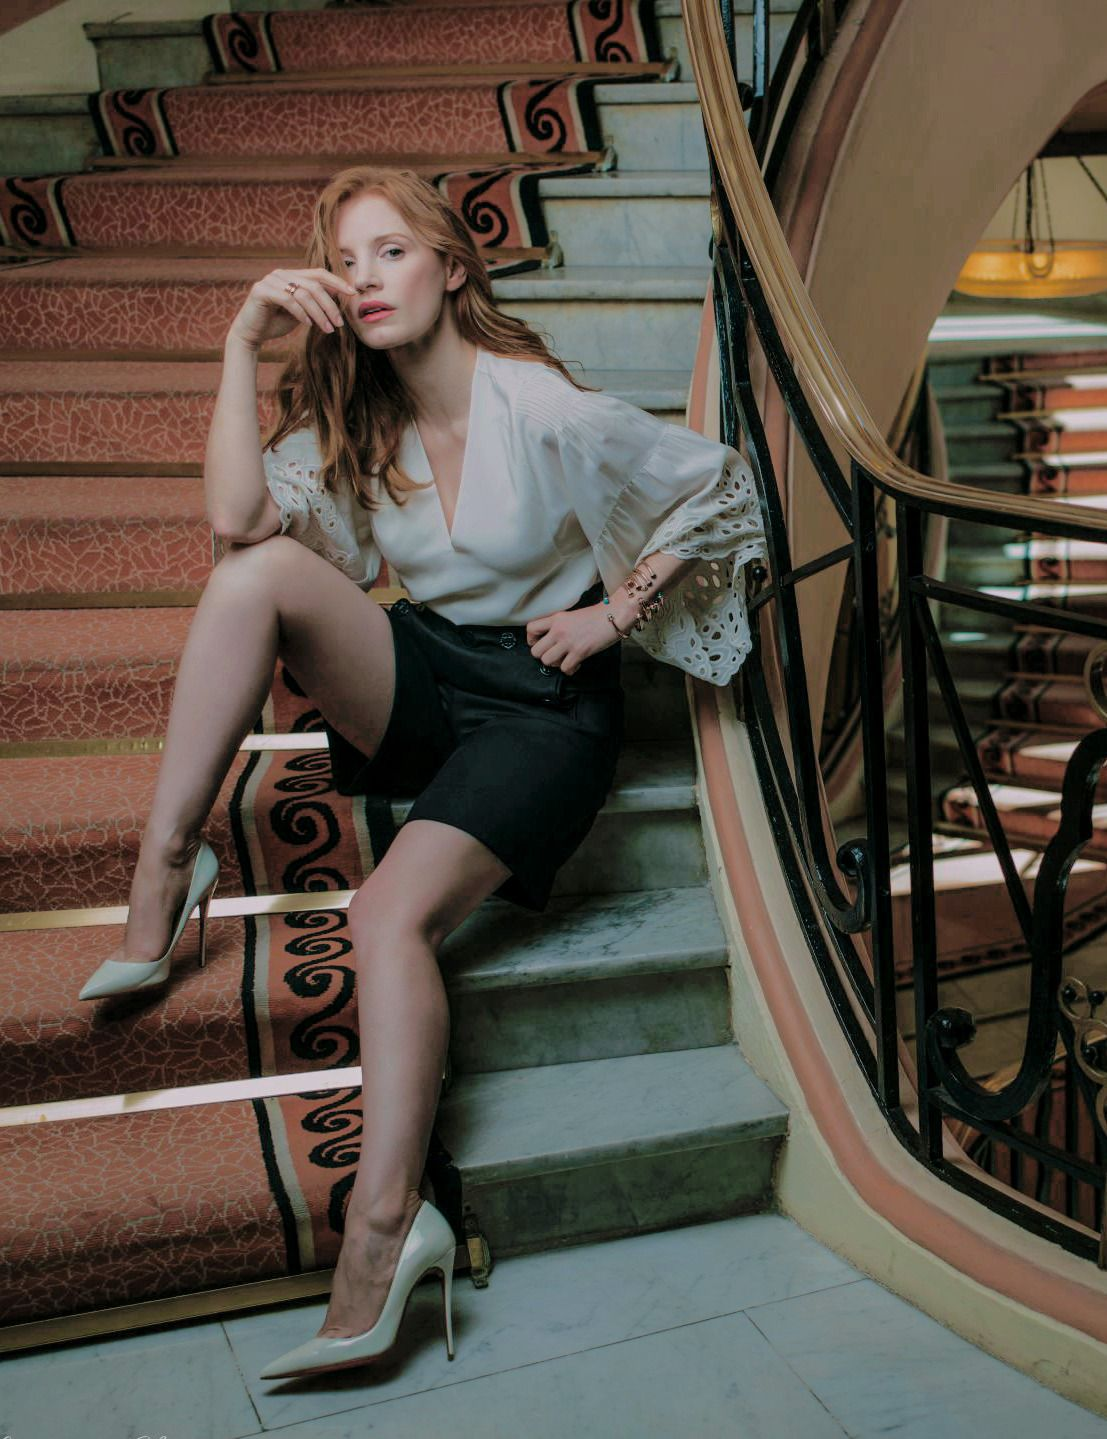 Jessica chastain hotties pinterest actresses actress jessica